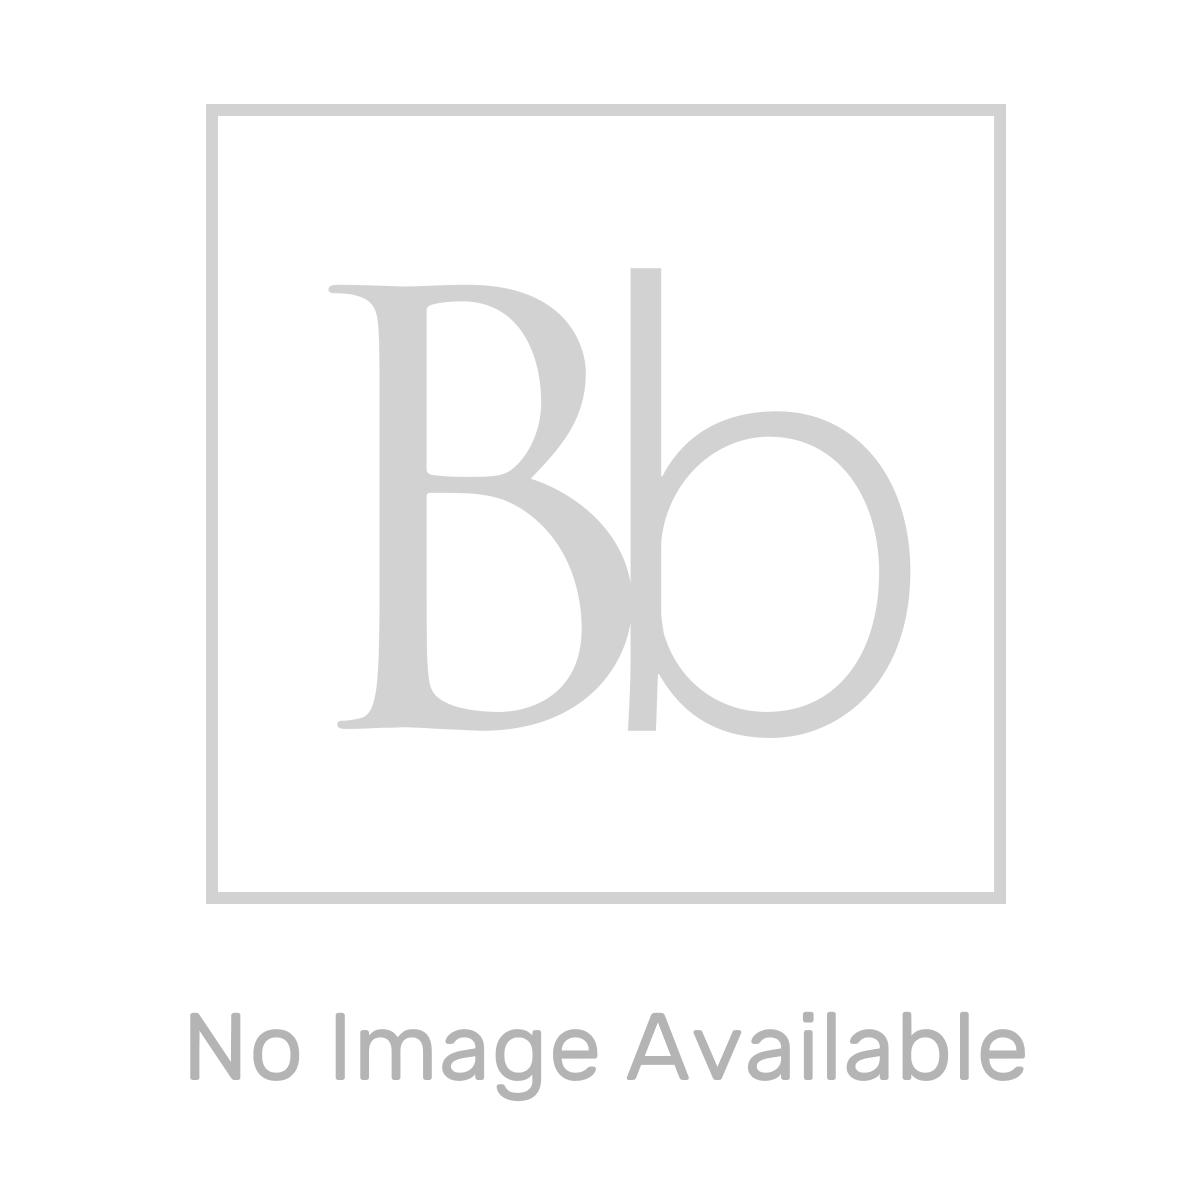 Merlyn Series 6 Sliding Door Shower Enclosure With Optional Side Panels